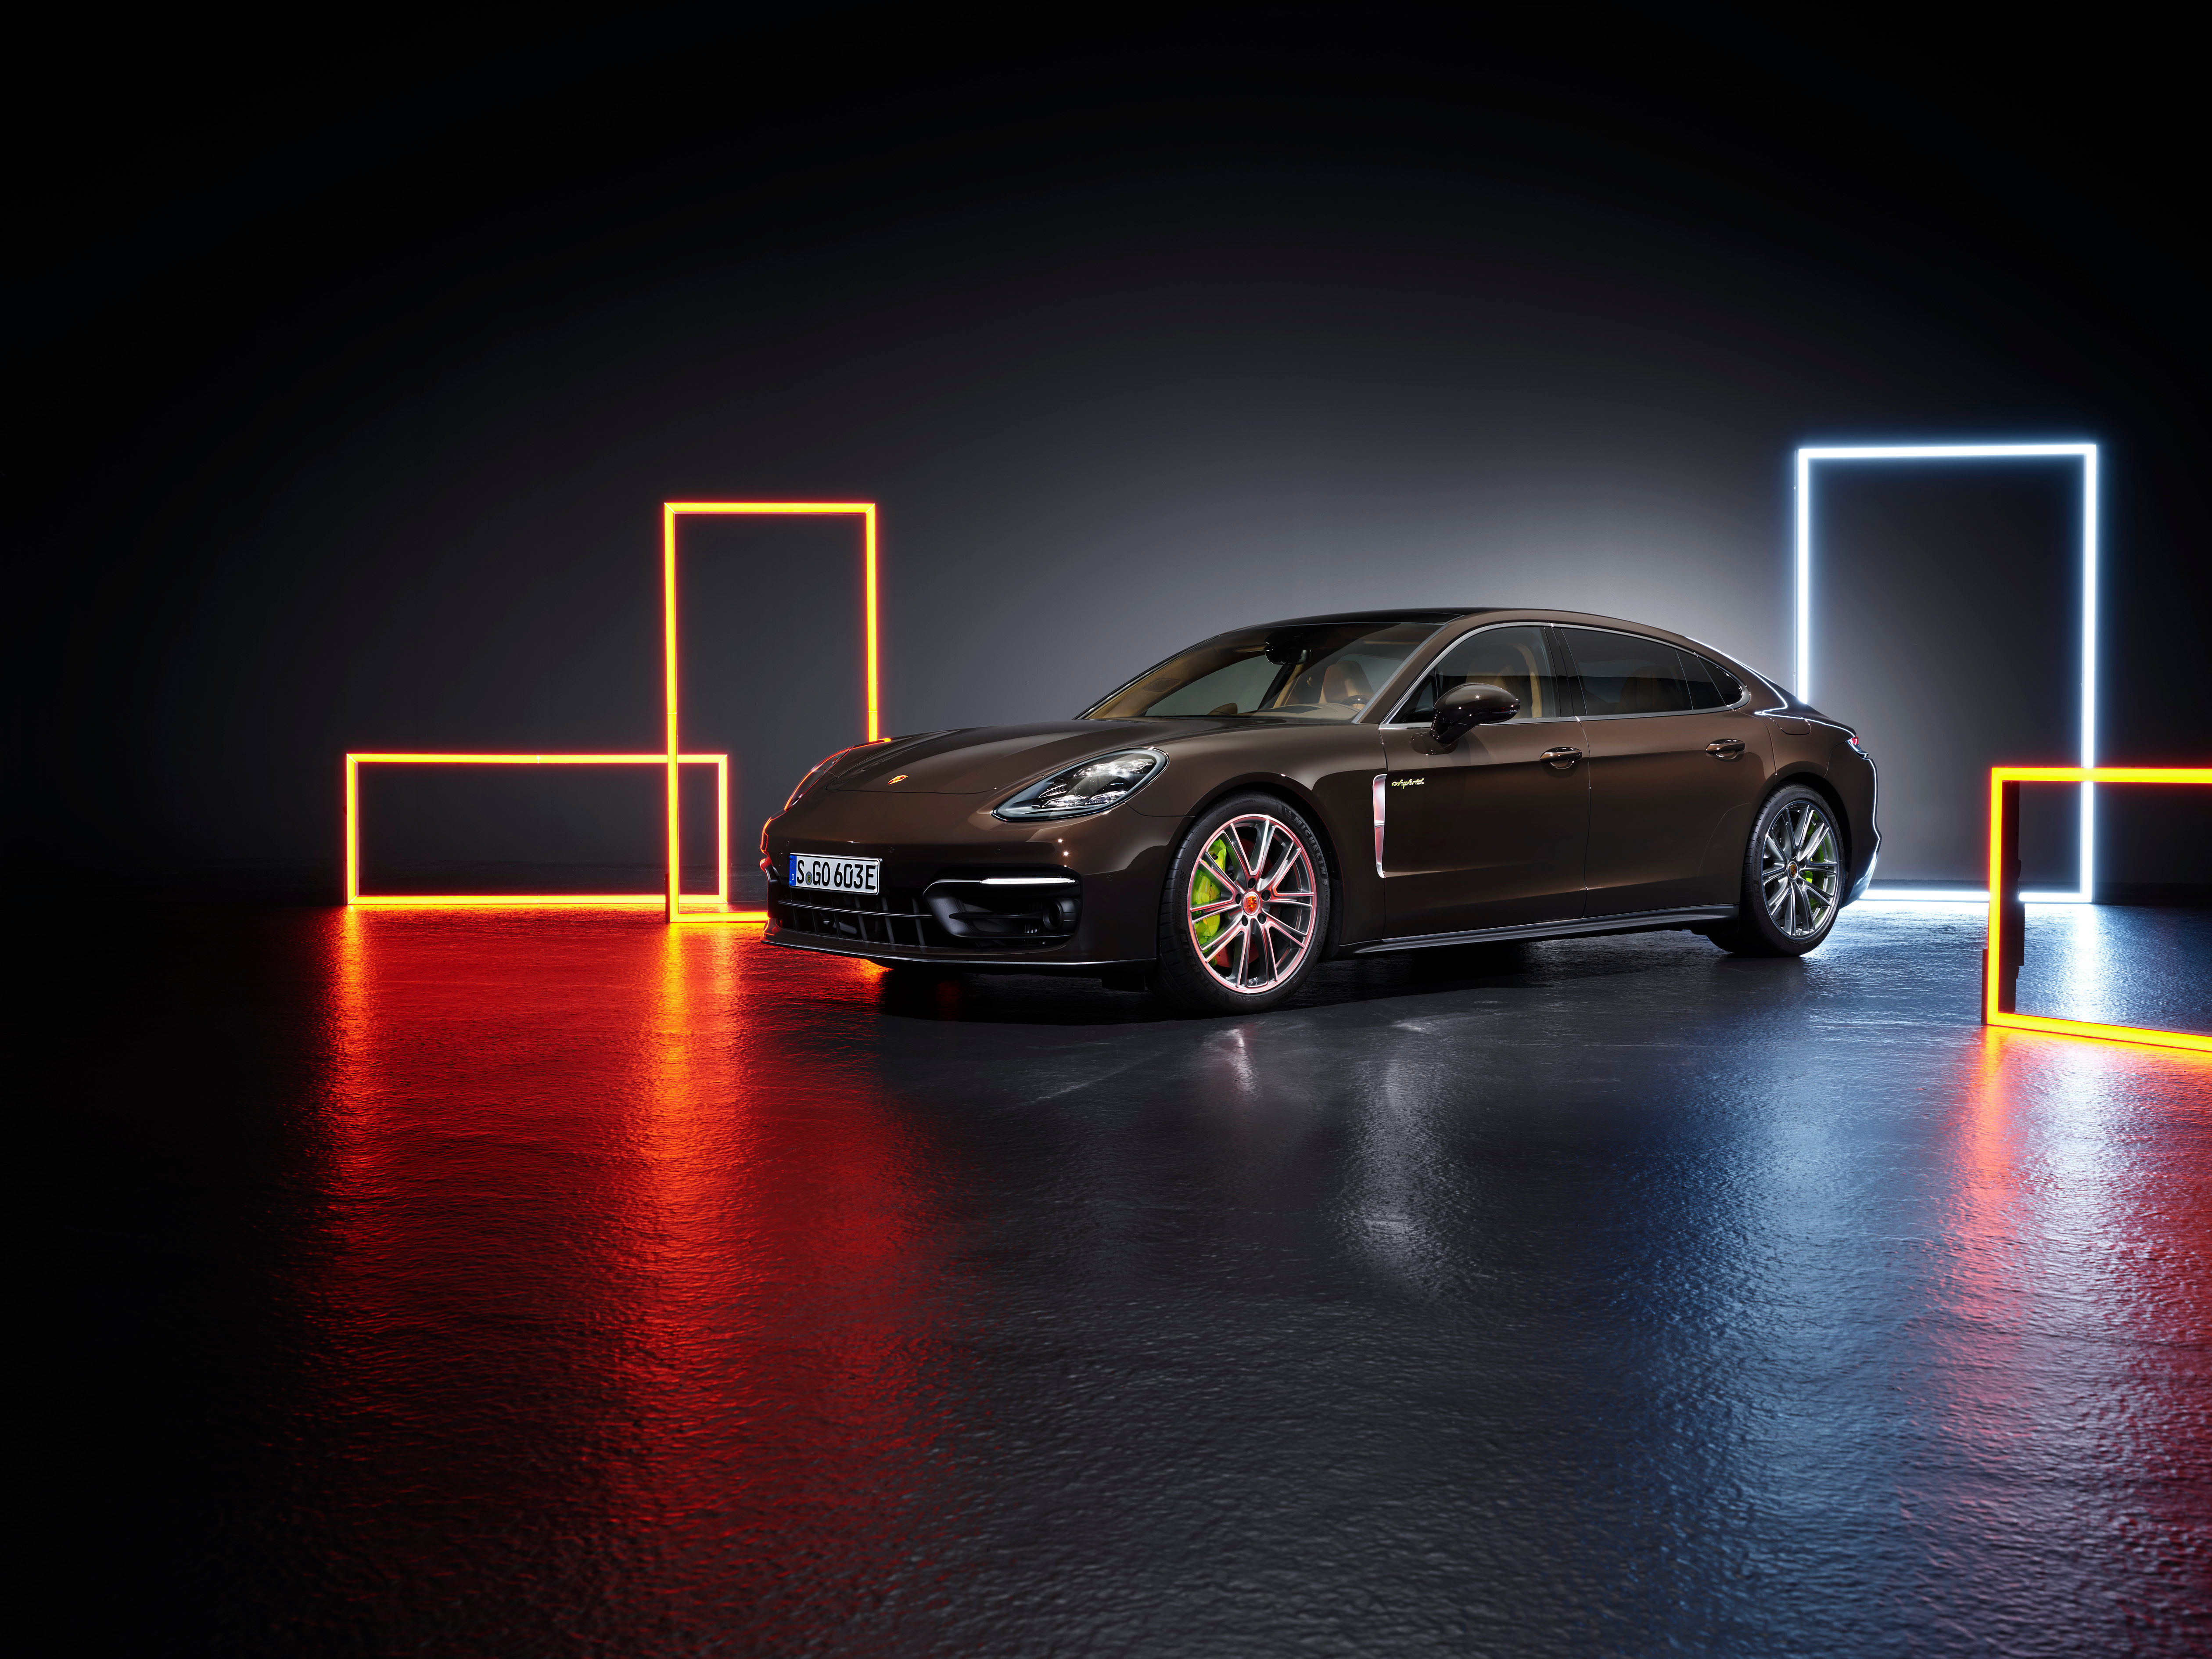 Фото Порше anamera 4S E-Hybrid Executive, (971), 2020 коричневые Сбоку Металлик Автомобили 5040x3780 Porsche Коричневый коричневая авто машины машина автомобиль